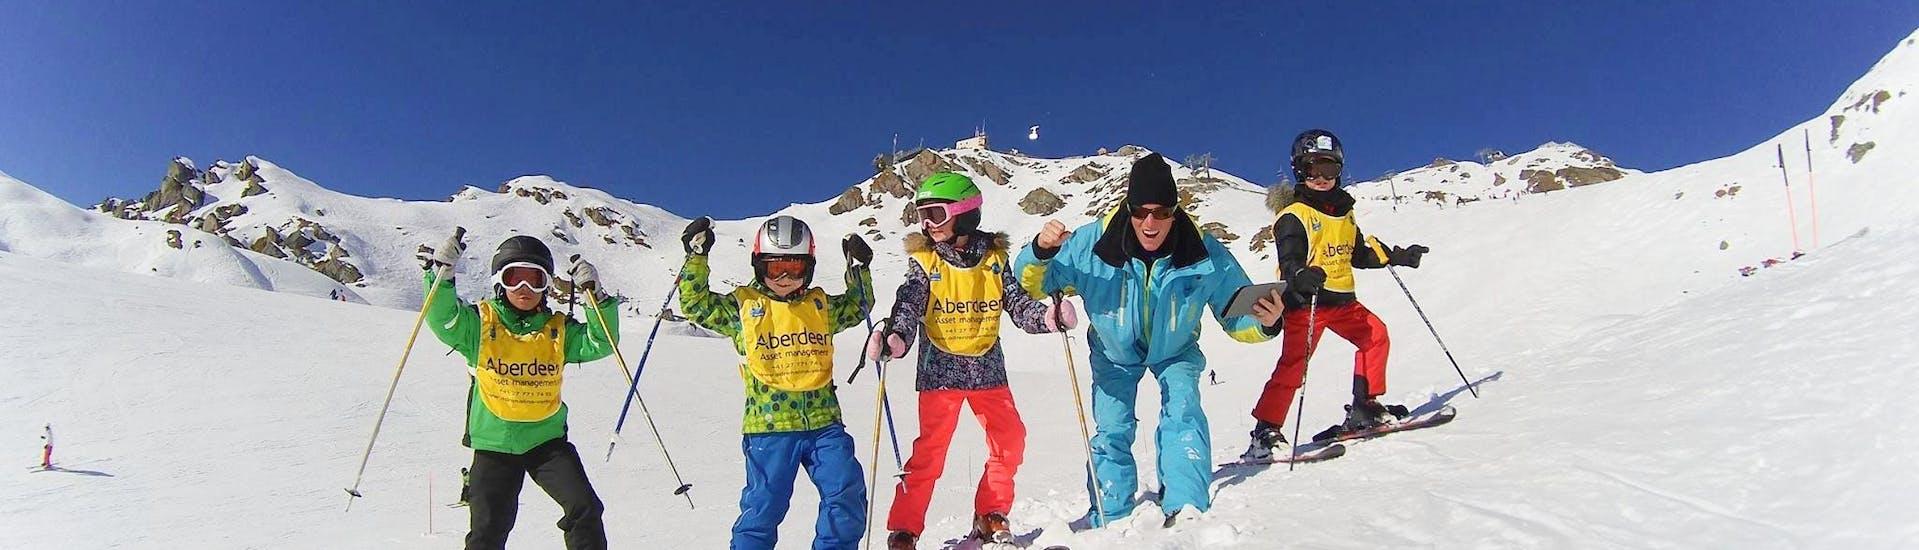 kids-ski-lessons-max-6-all-levels-adrenaline-verbier-hero